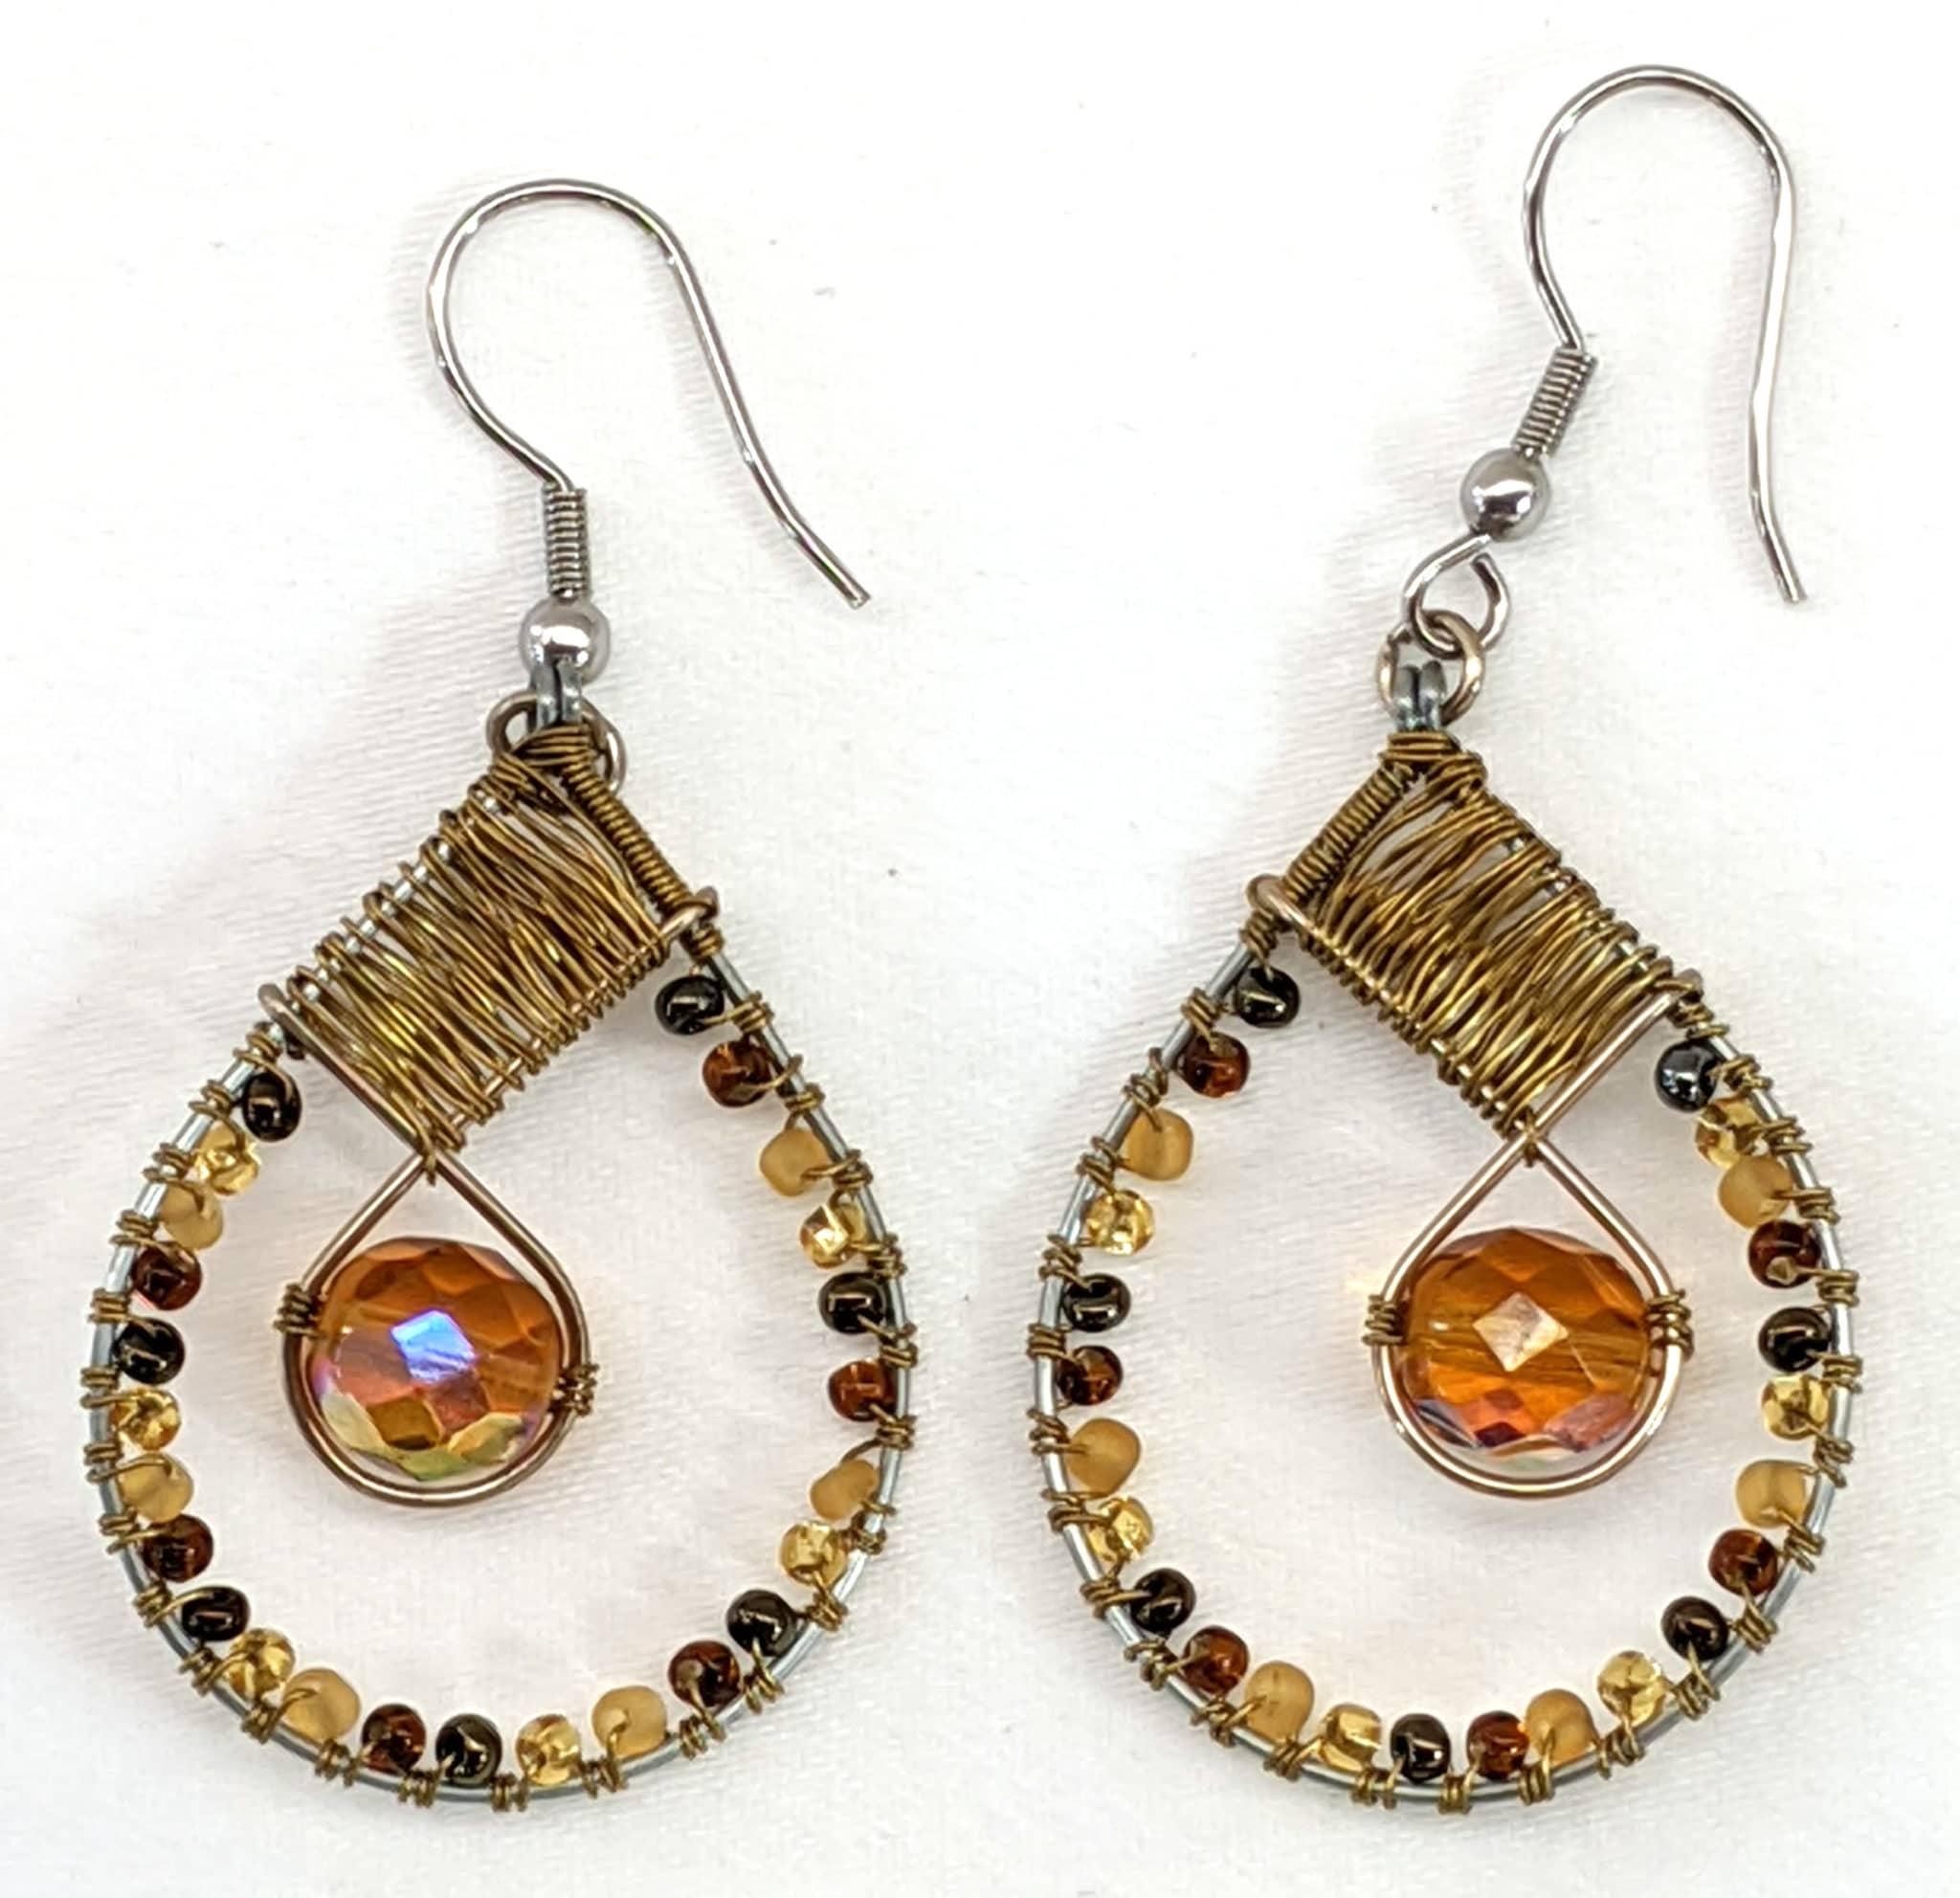 Teardrop with Crystal Beaded Earrings - Golds